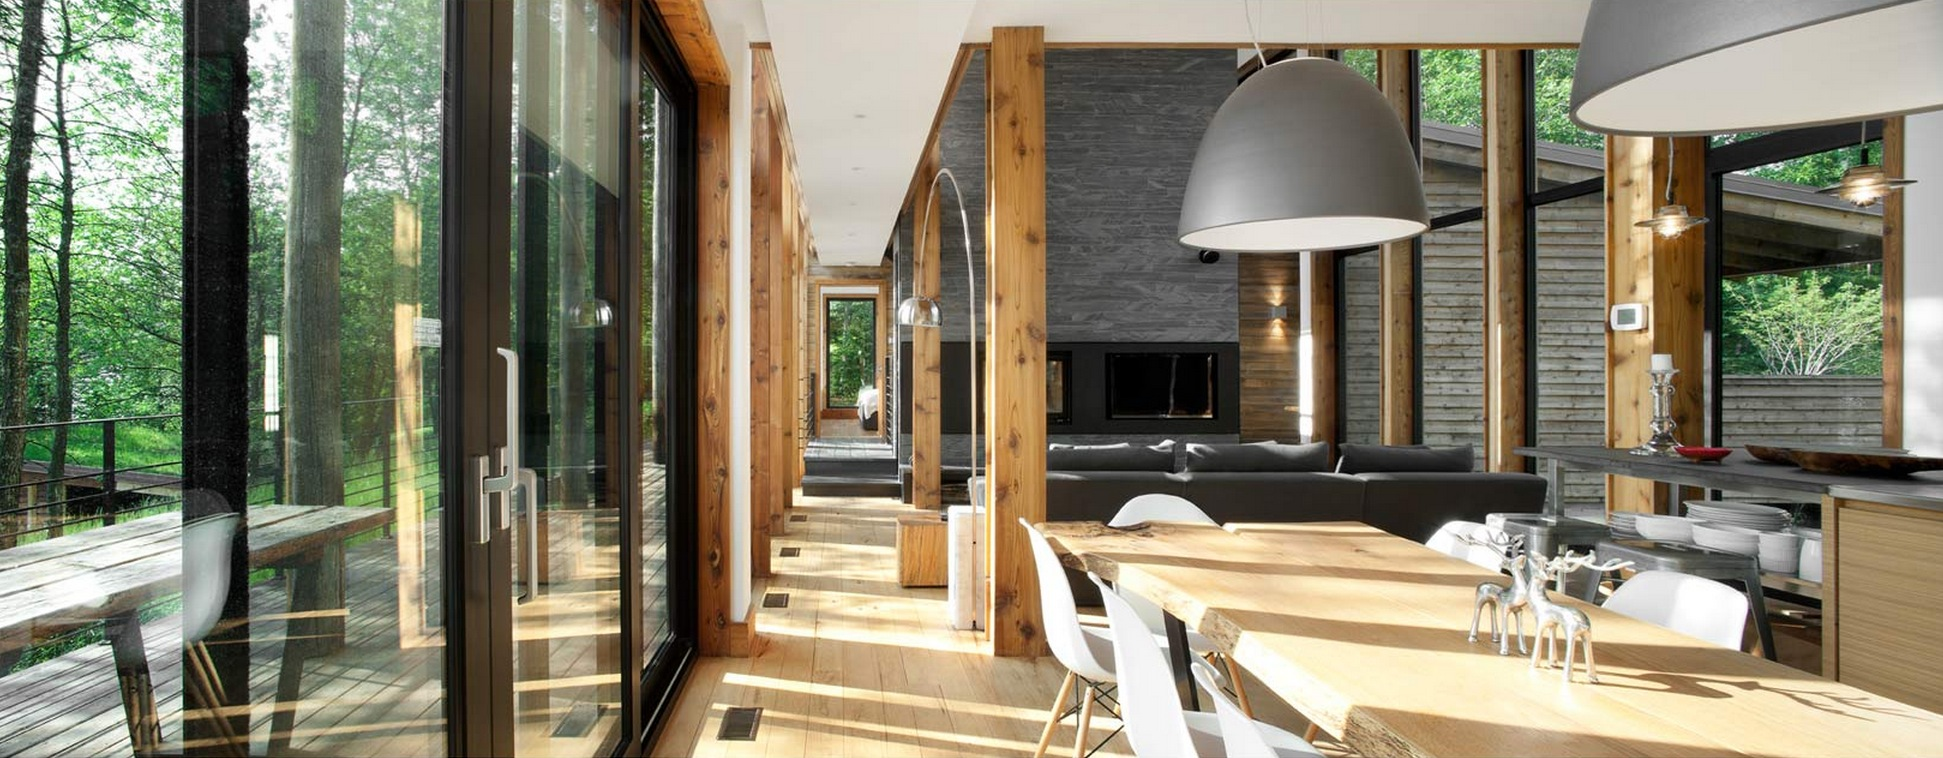 Residence-Massawippi-Huma-Design-Quebec-05